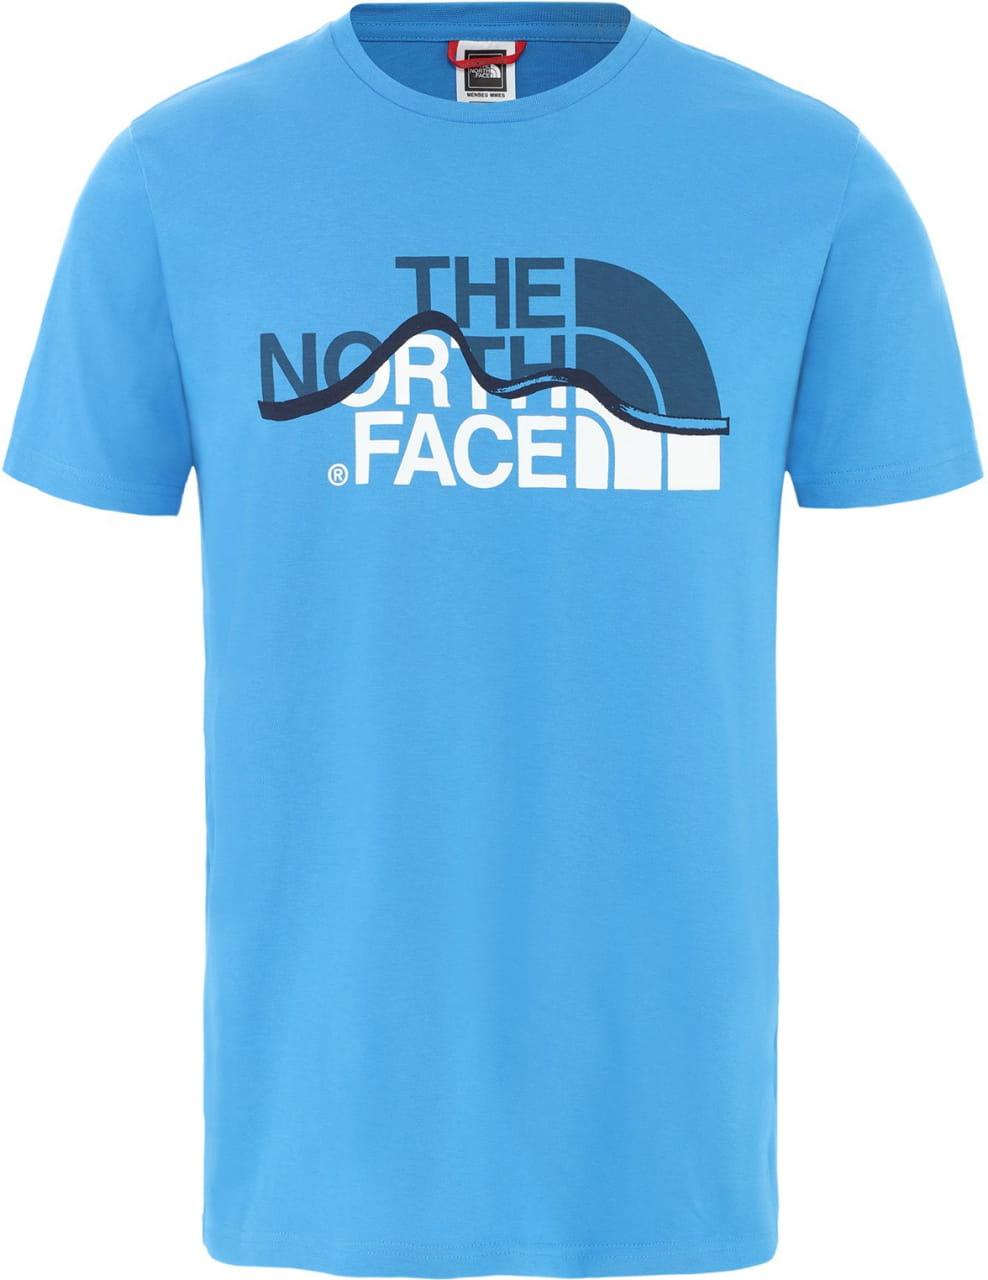 Pánské tričko The North Face Men's Mountain Line T-Shirt